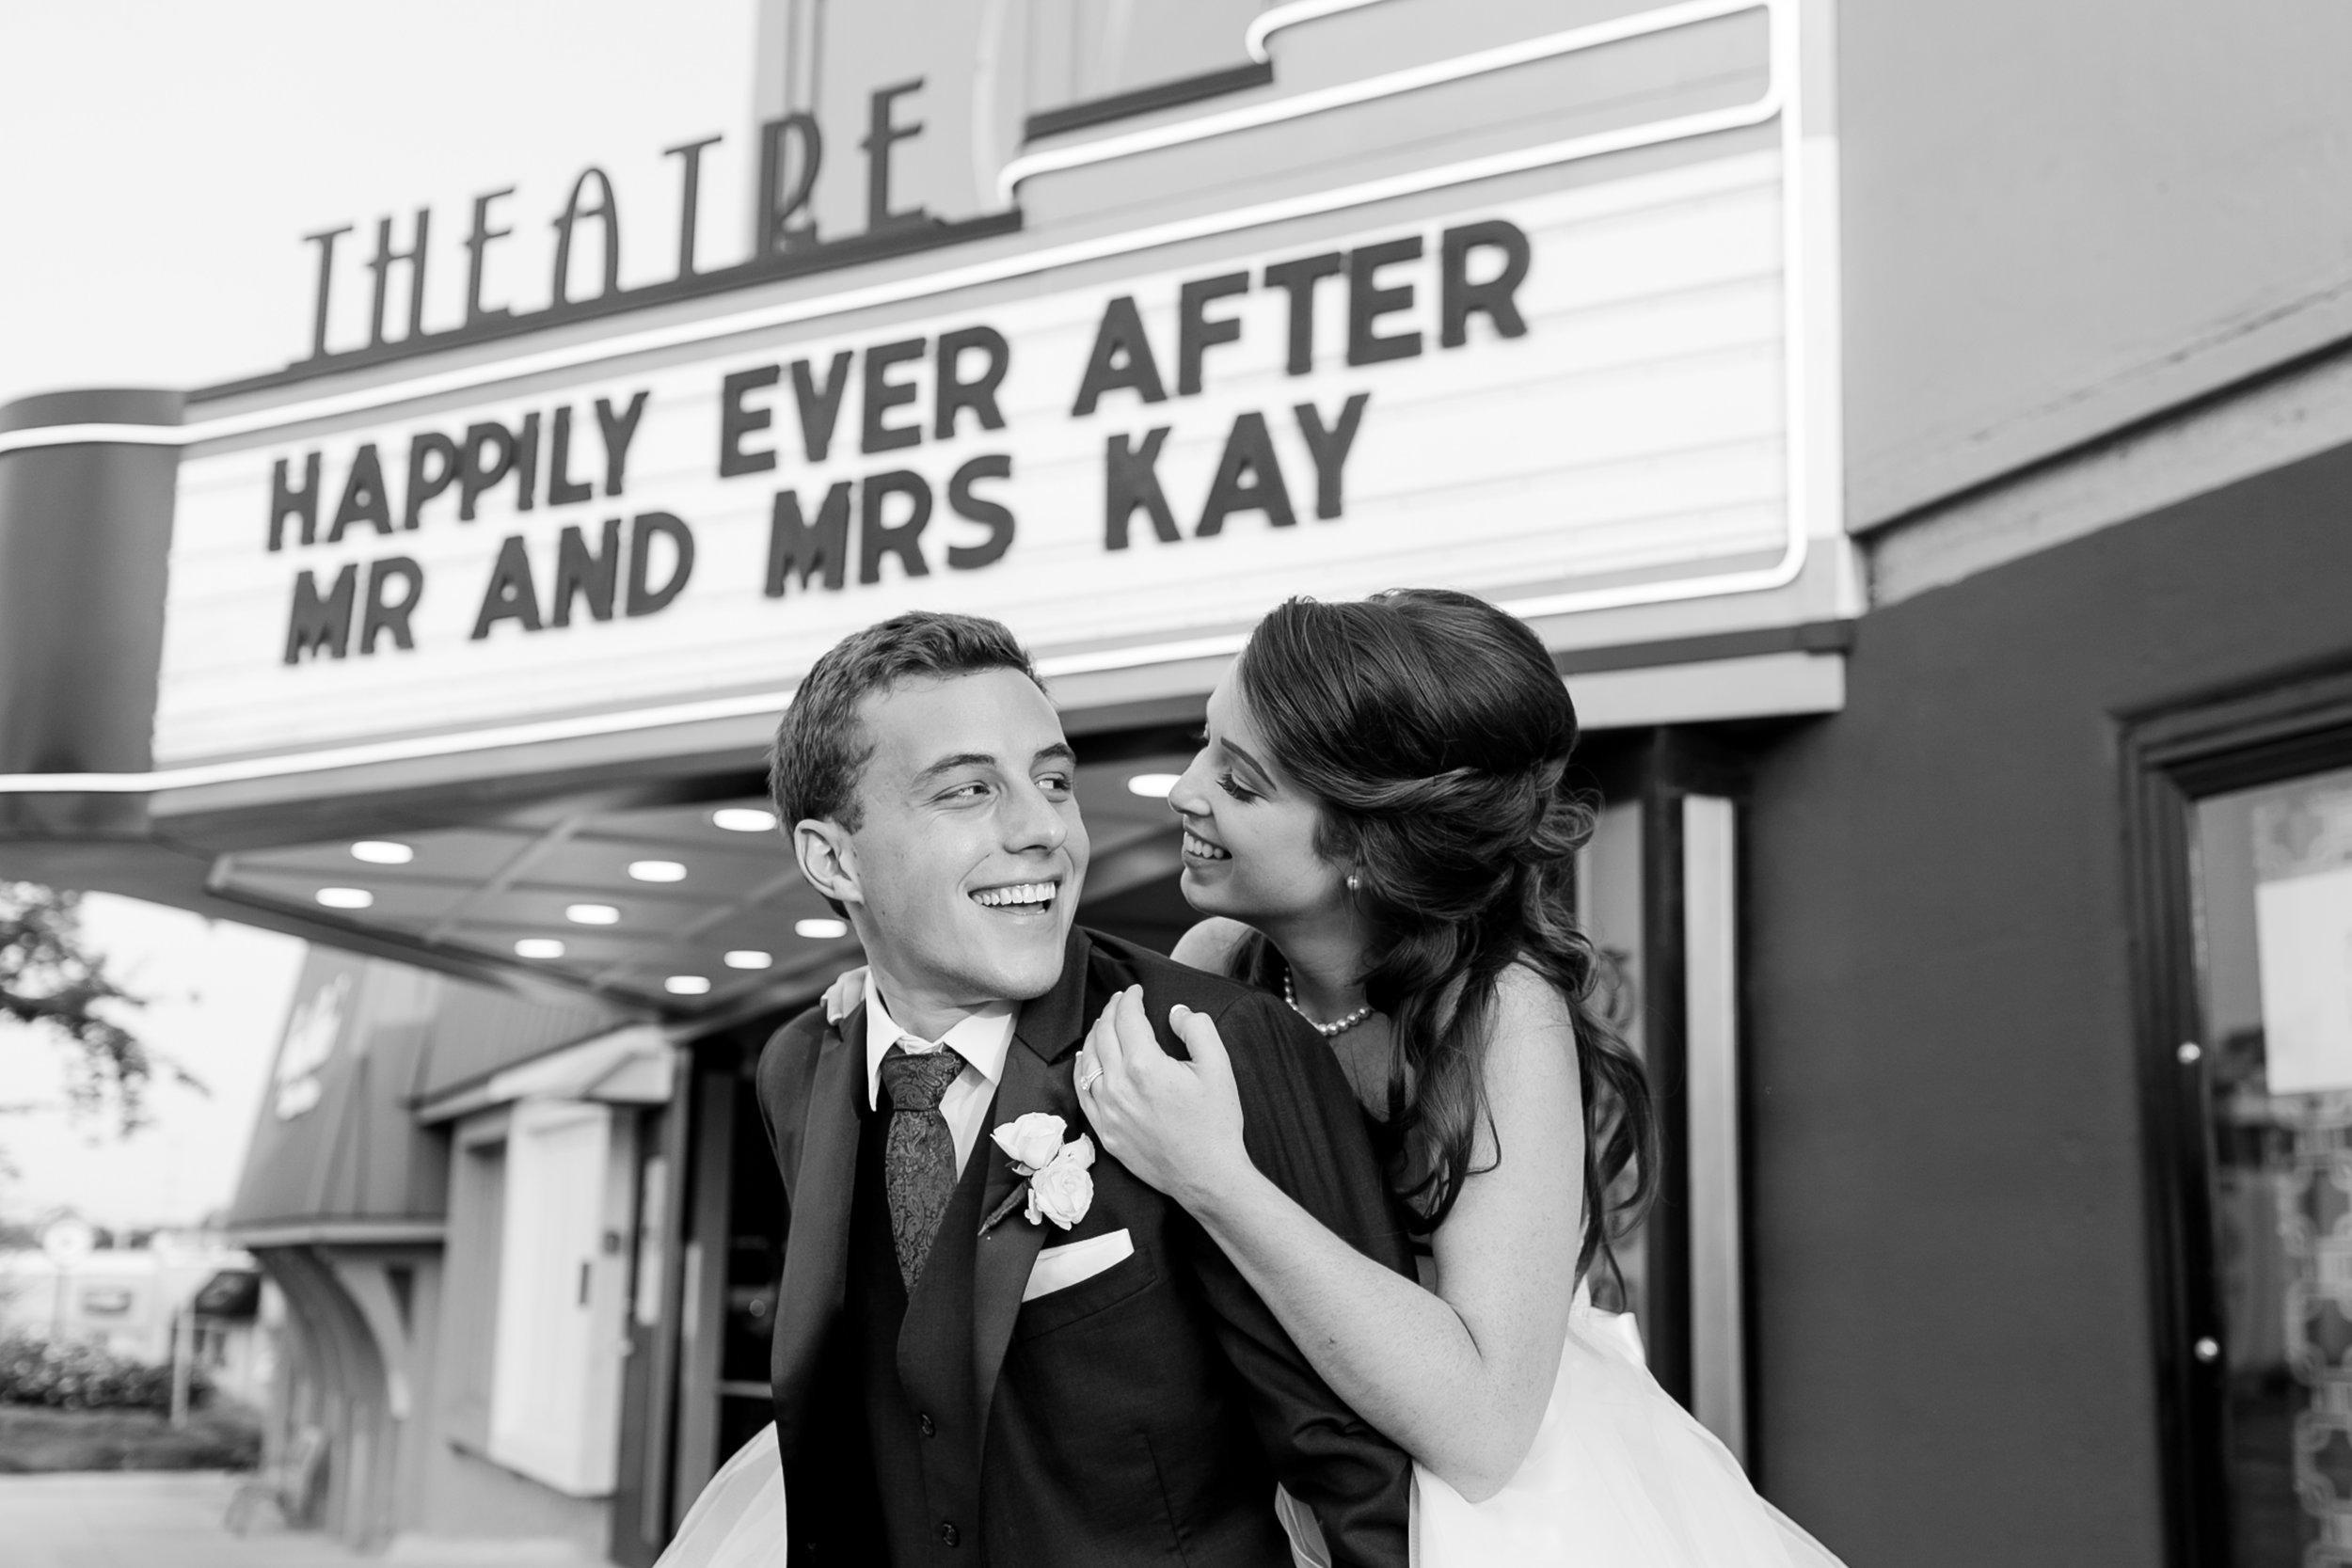 2017Sept9-Kay-Wedding-MissionTheatre-0687-2.jpg